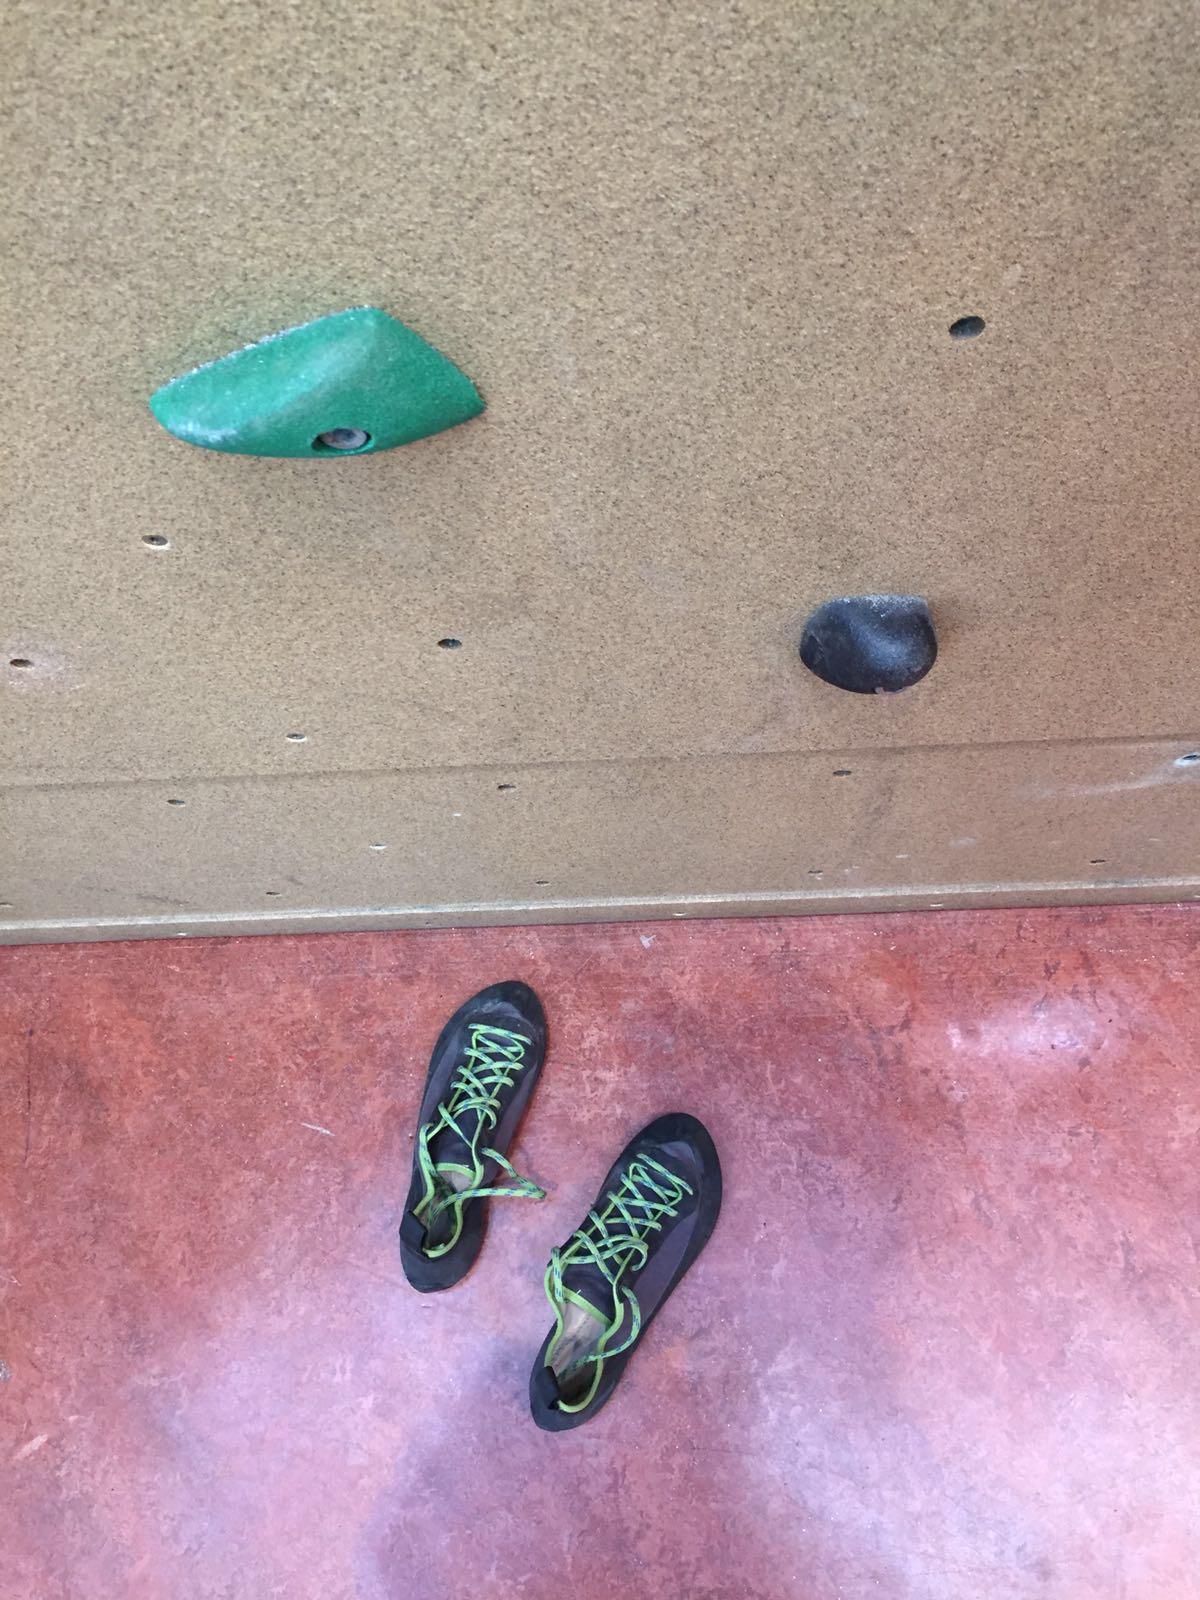 klimschoenen bij klimwand